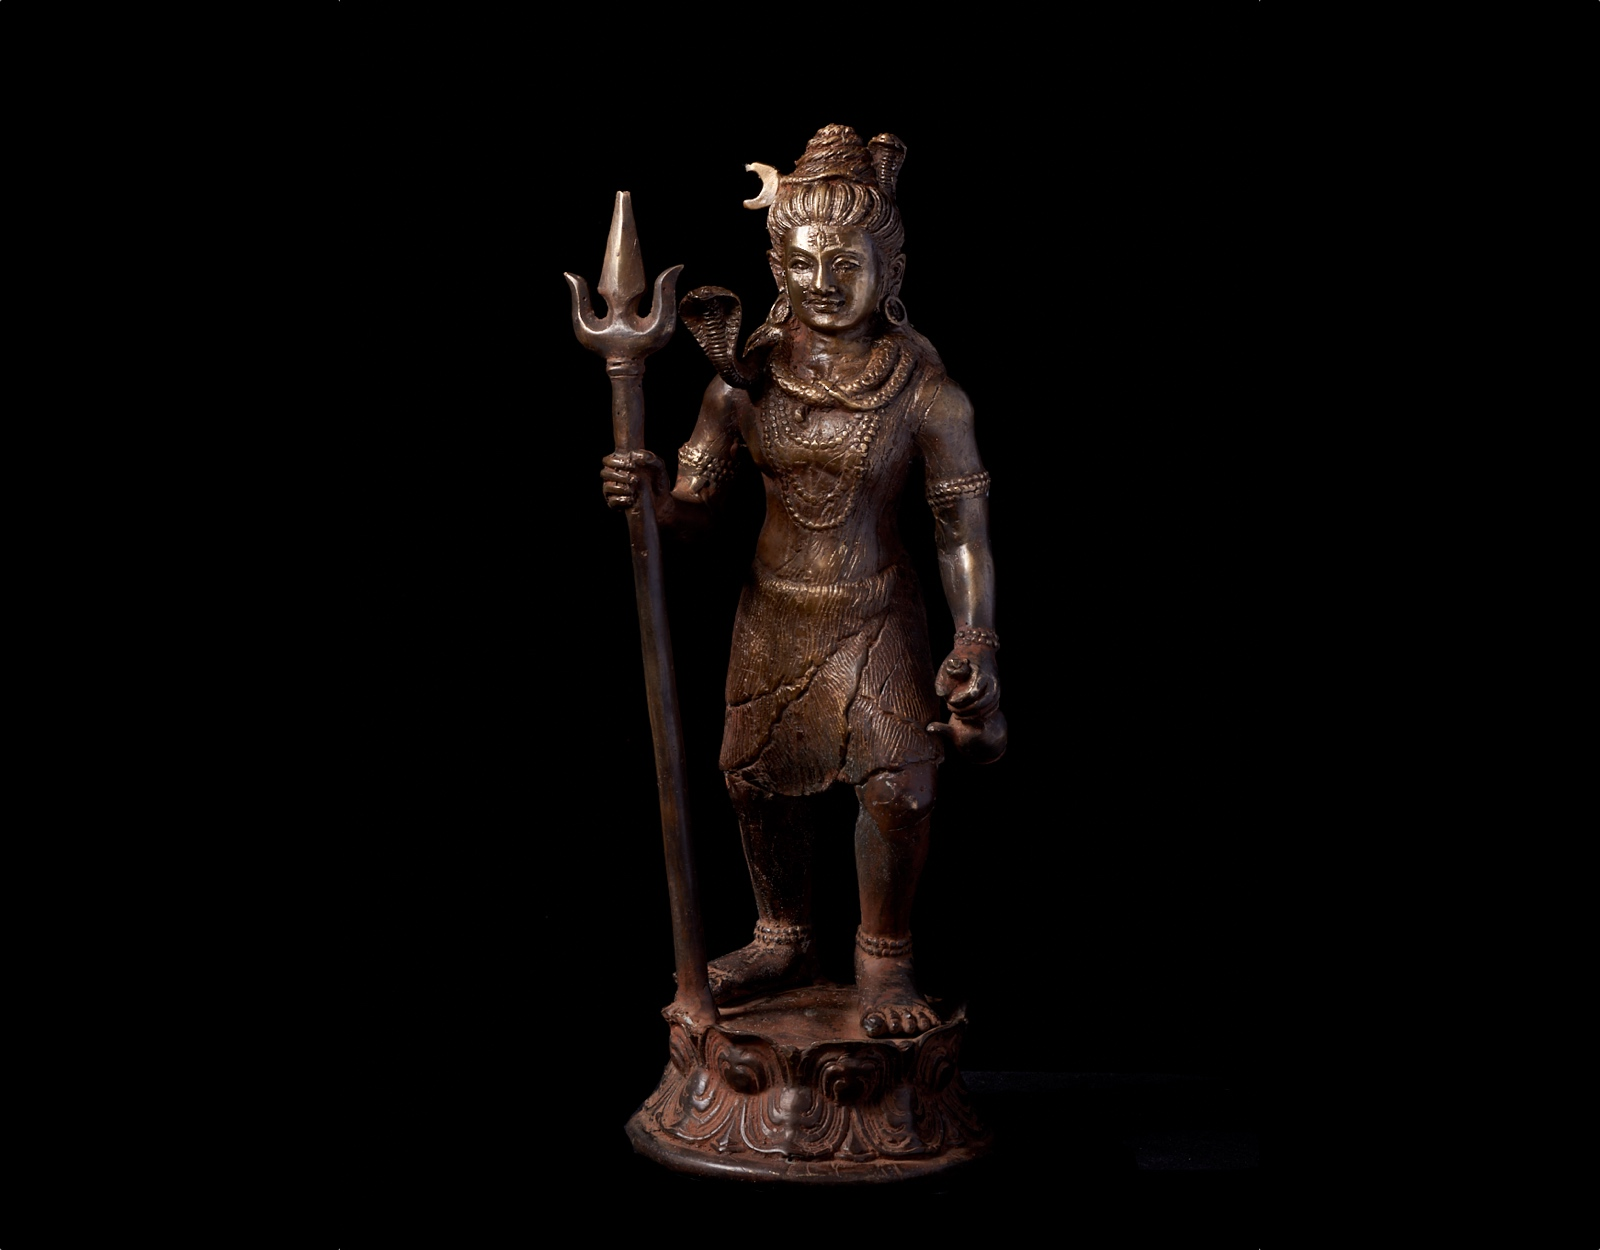 Бронзовая статуя Шива с трезубцем. 24см. фото VipKeris